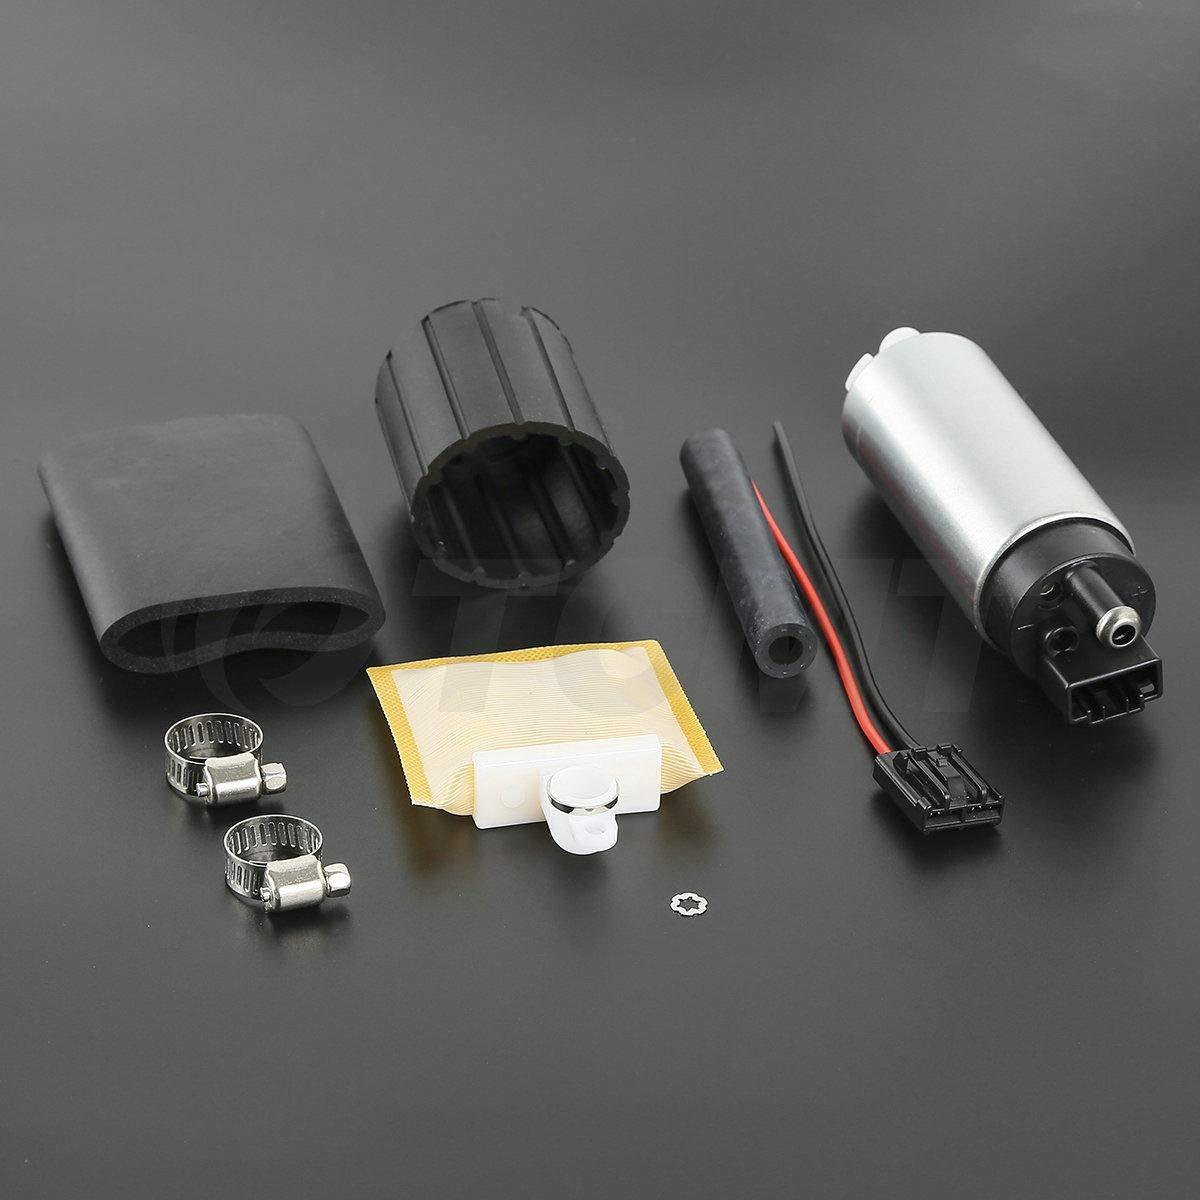 TCMT Intank Bomba de combustible + Kit para Toyota Celica reemplazar Walbro gss341 gss342 255lph: Amazon.es: Coche y moto